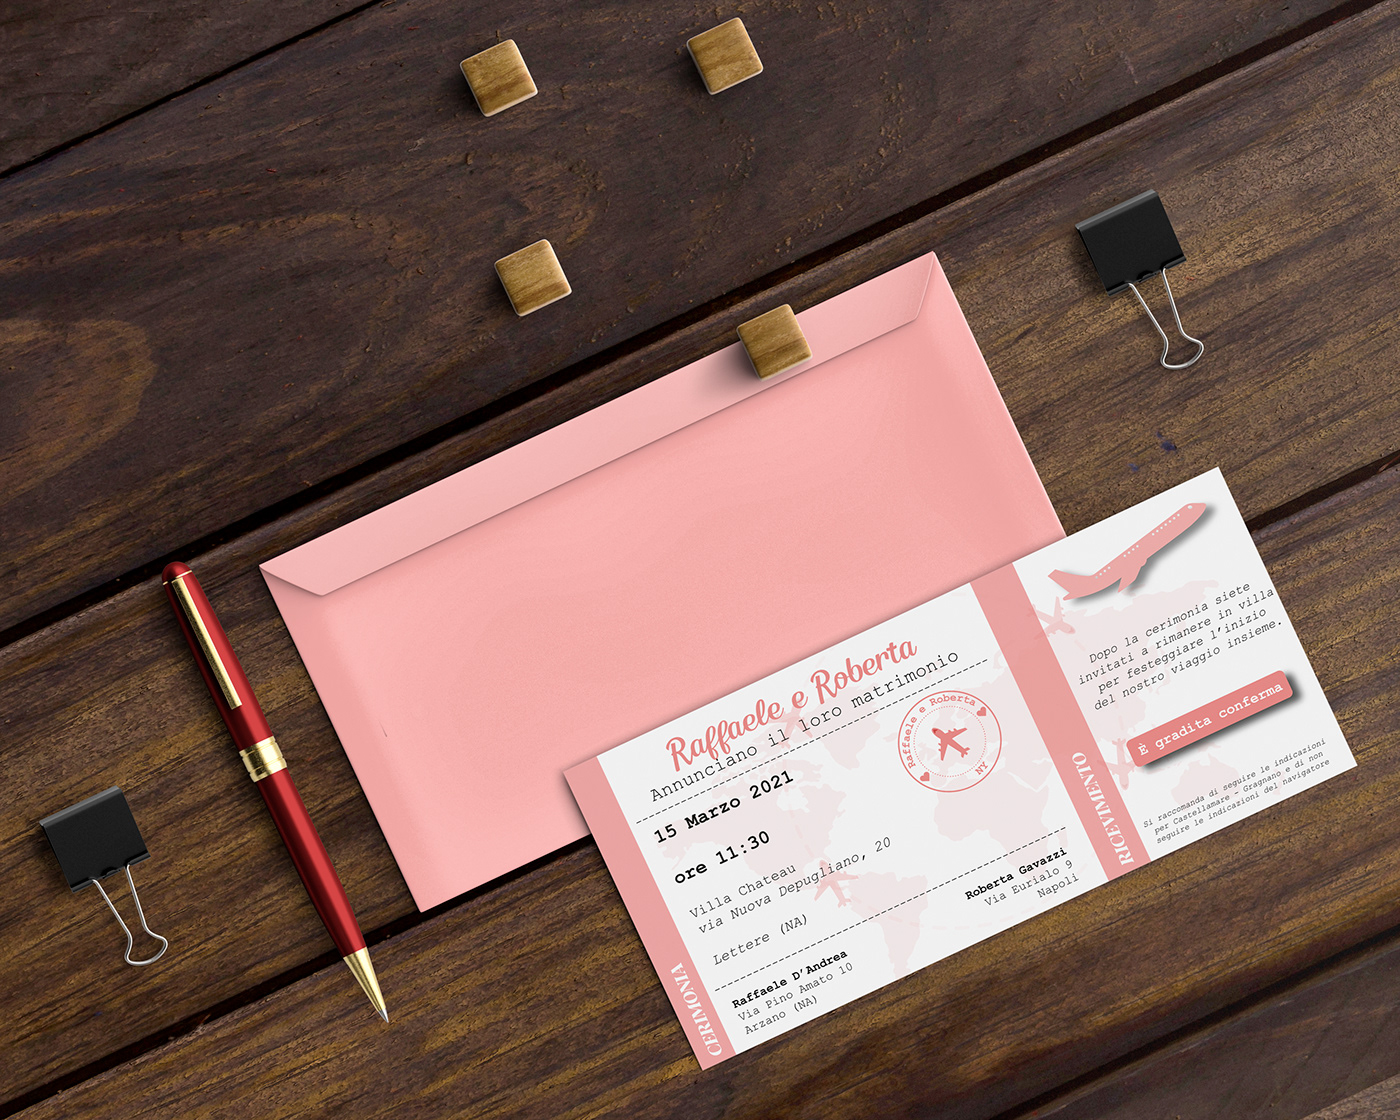 card envelope Invitation plane rose Travel wedding